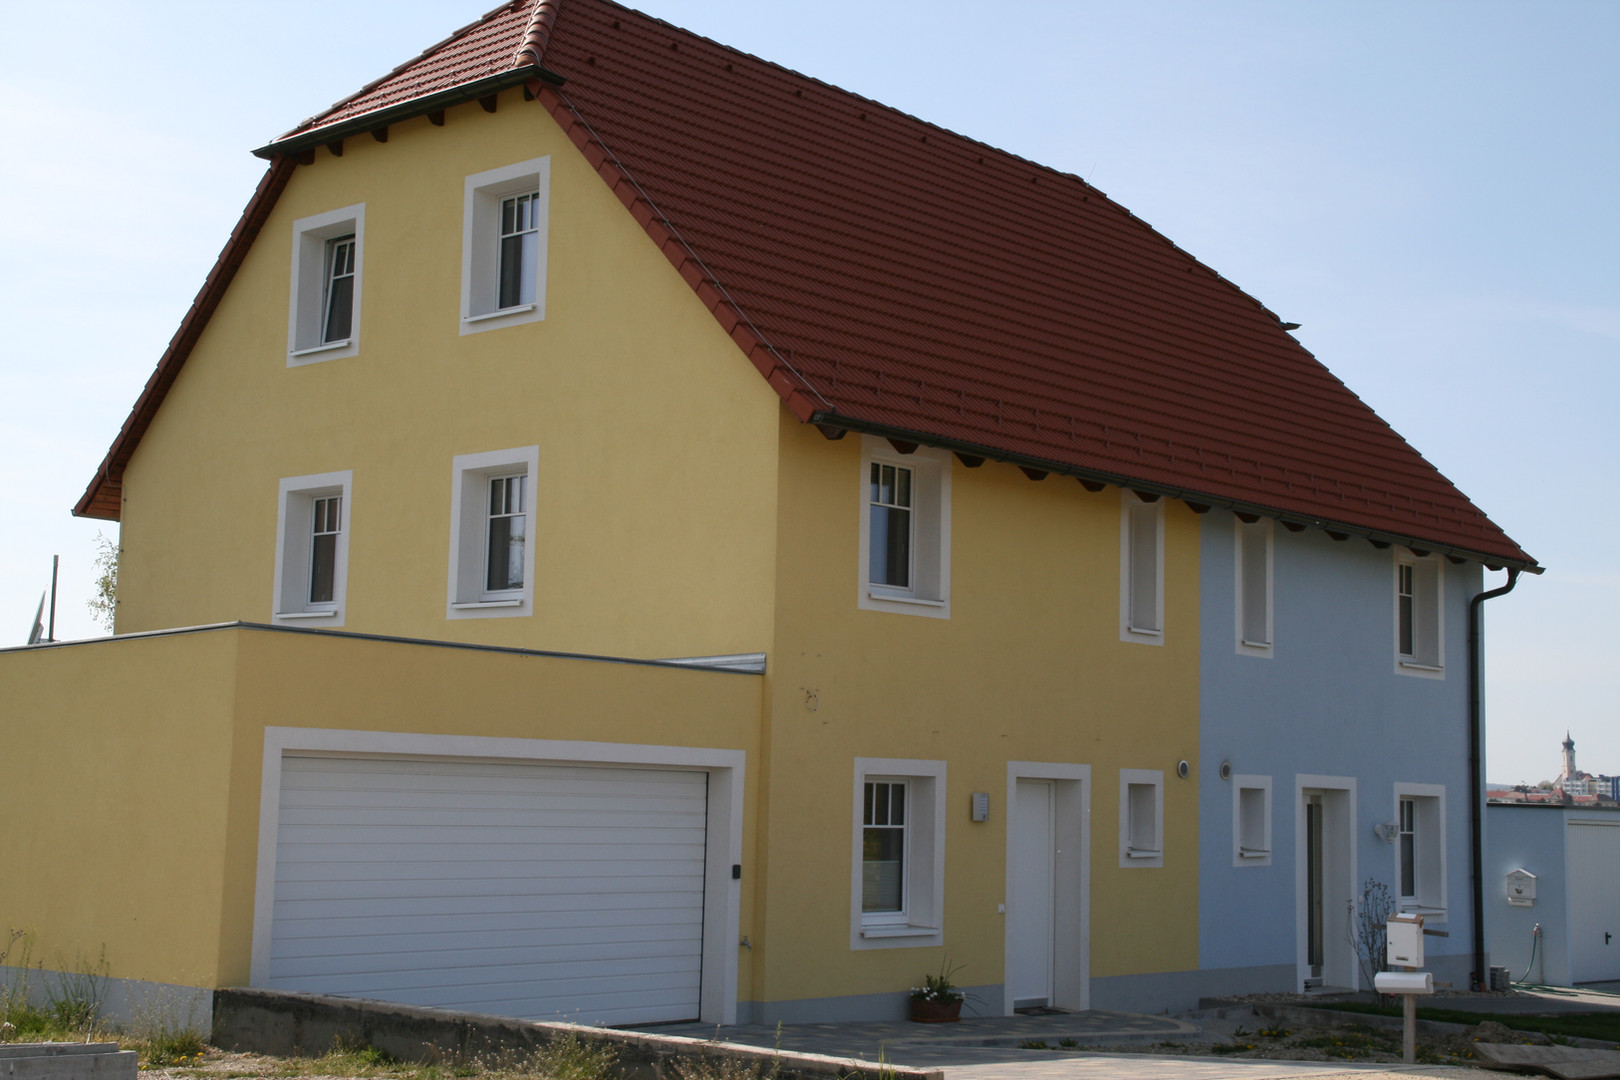 Passivdoppelhaus Ebendorf 02.JPG